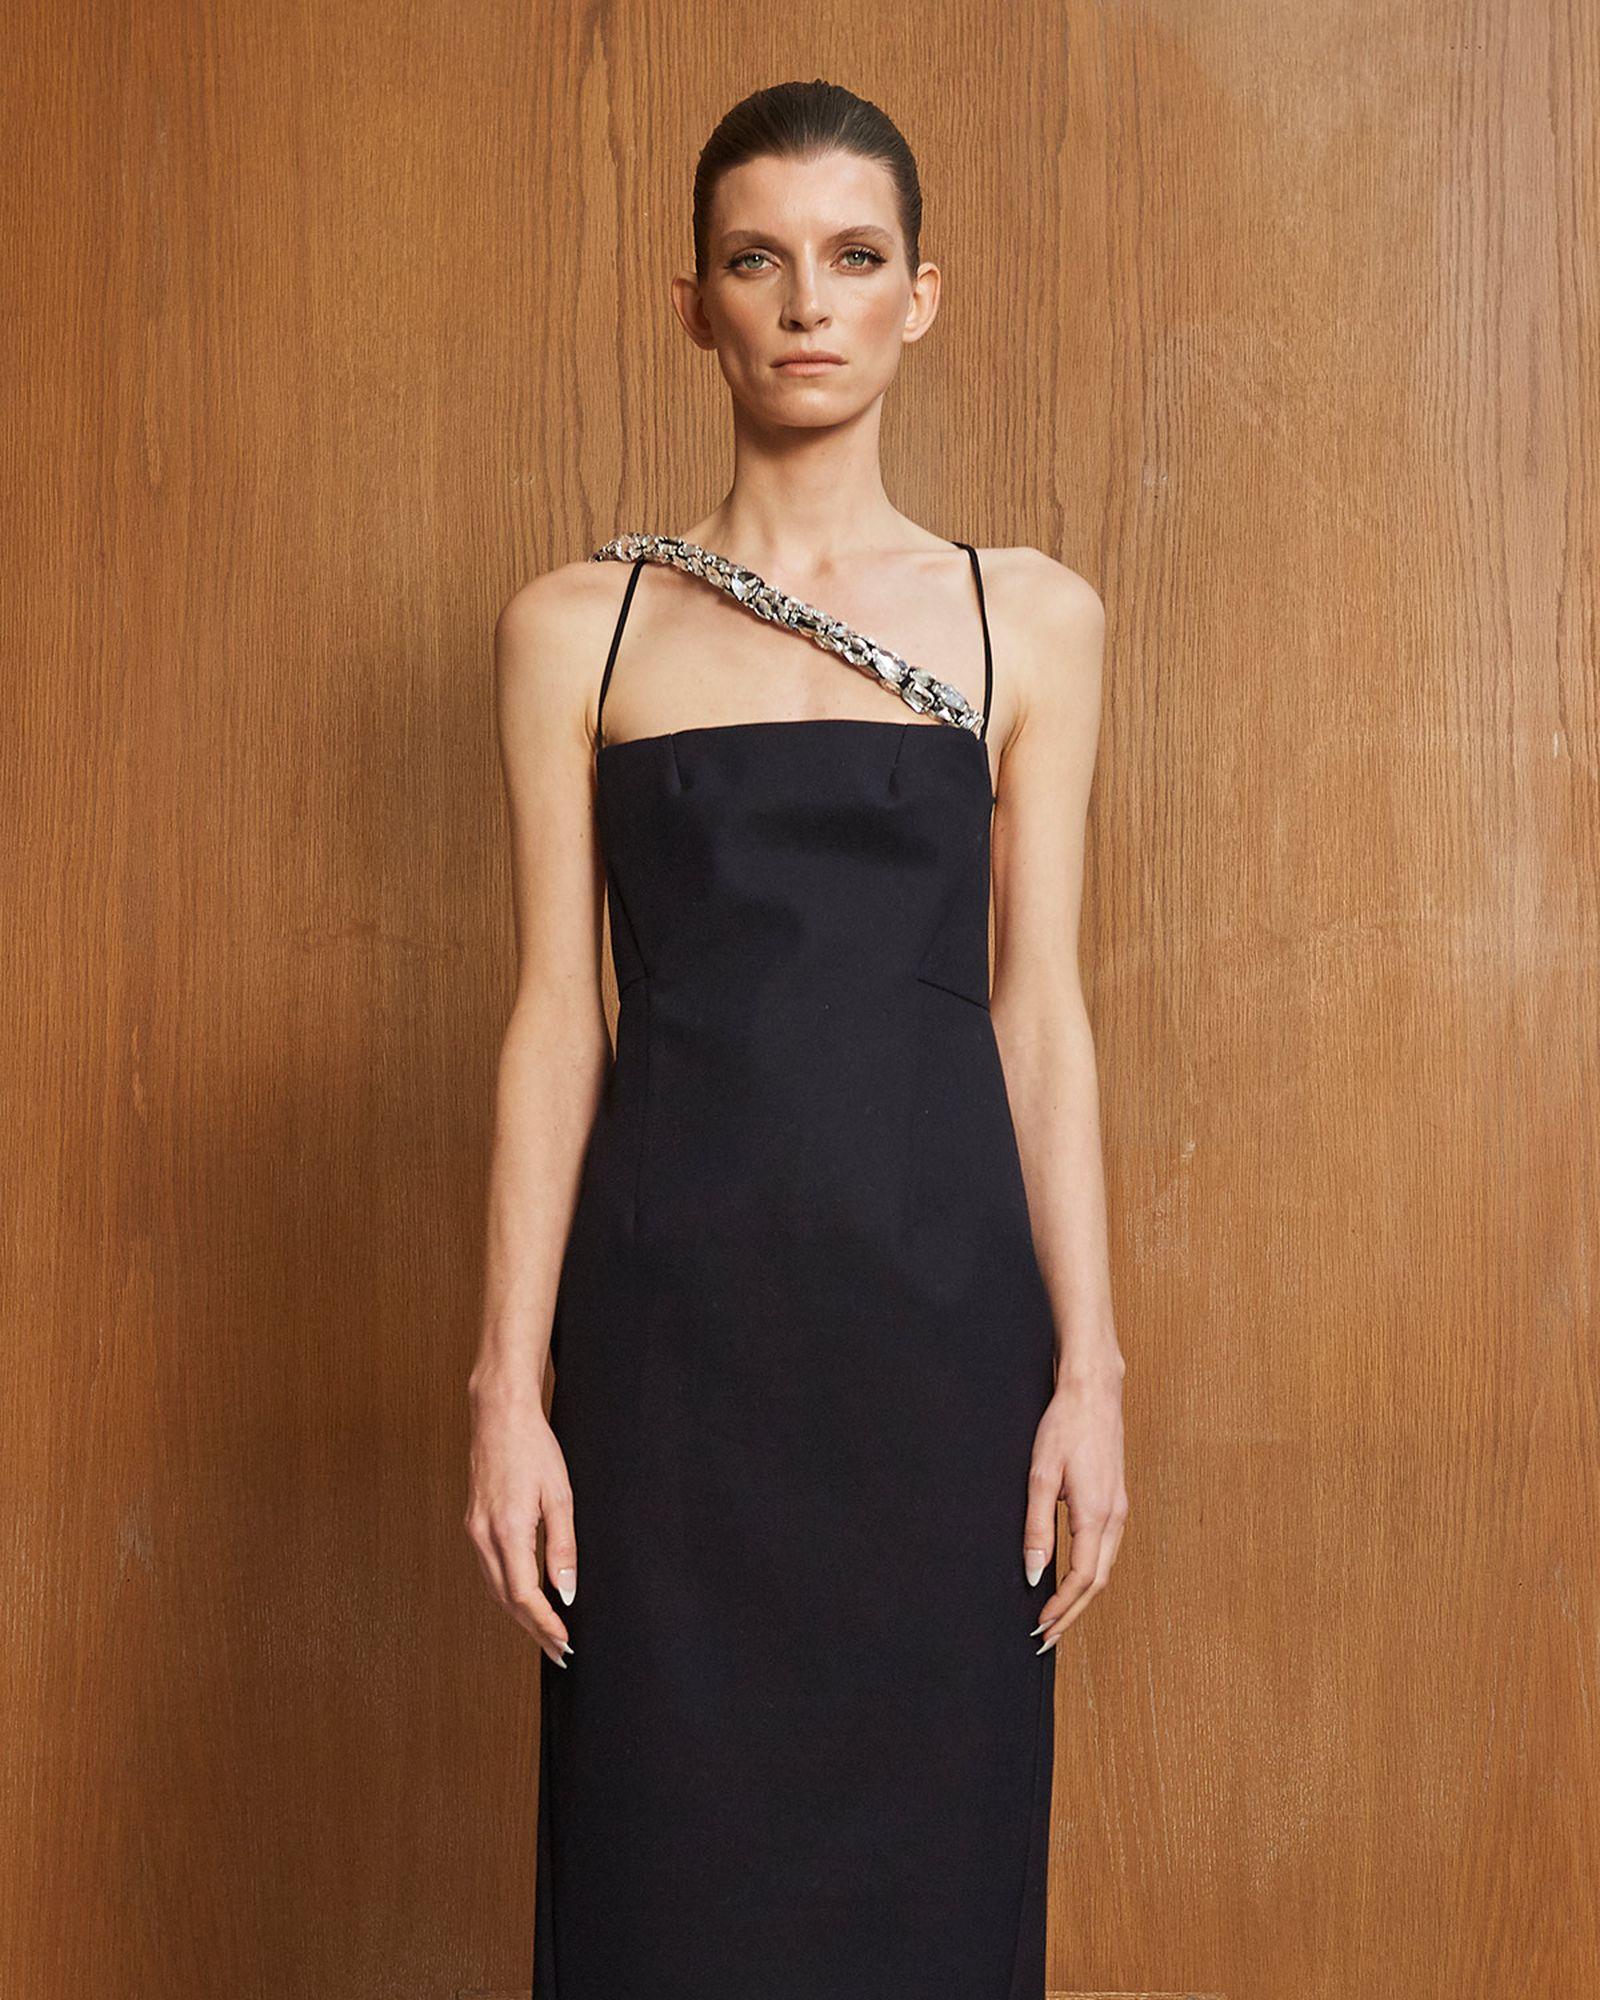 032c-rtw-womenswear-collection-paris-main